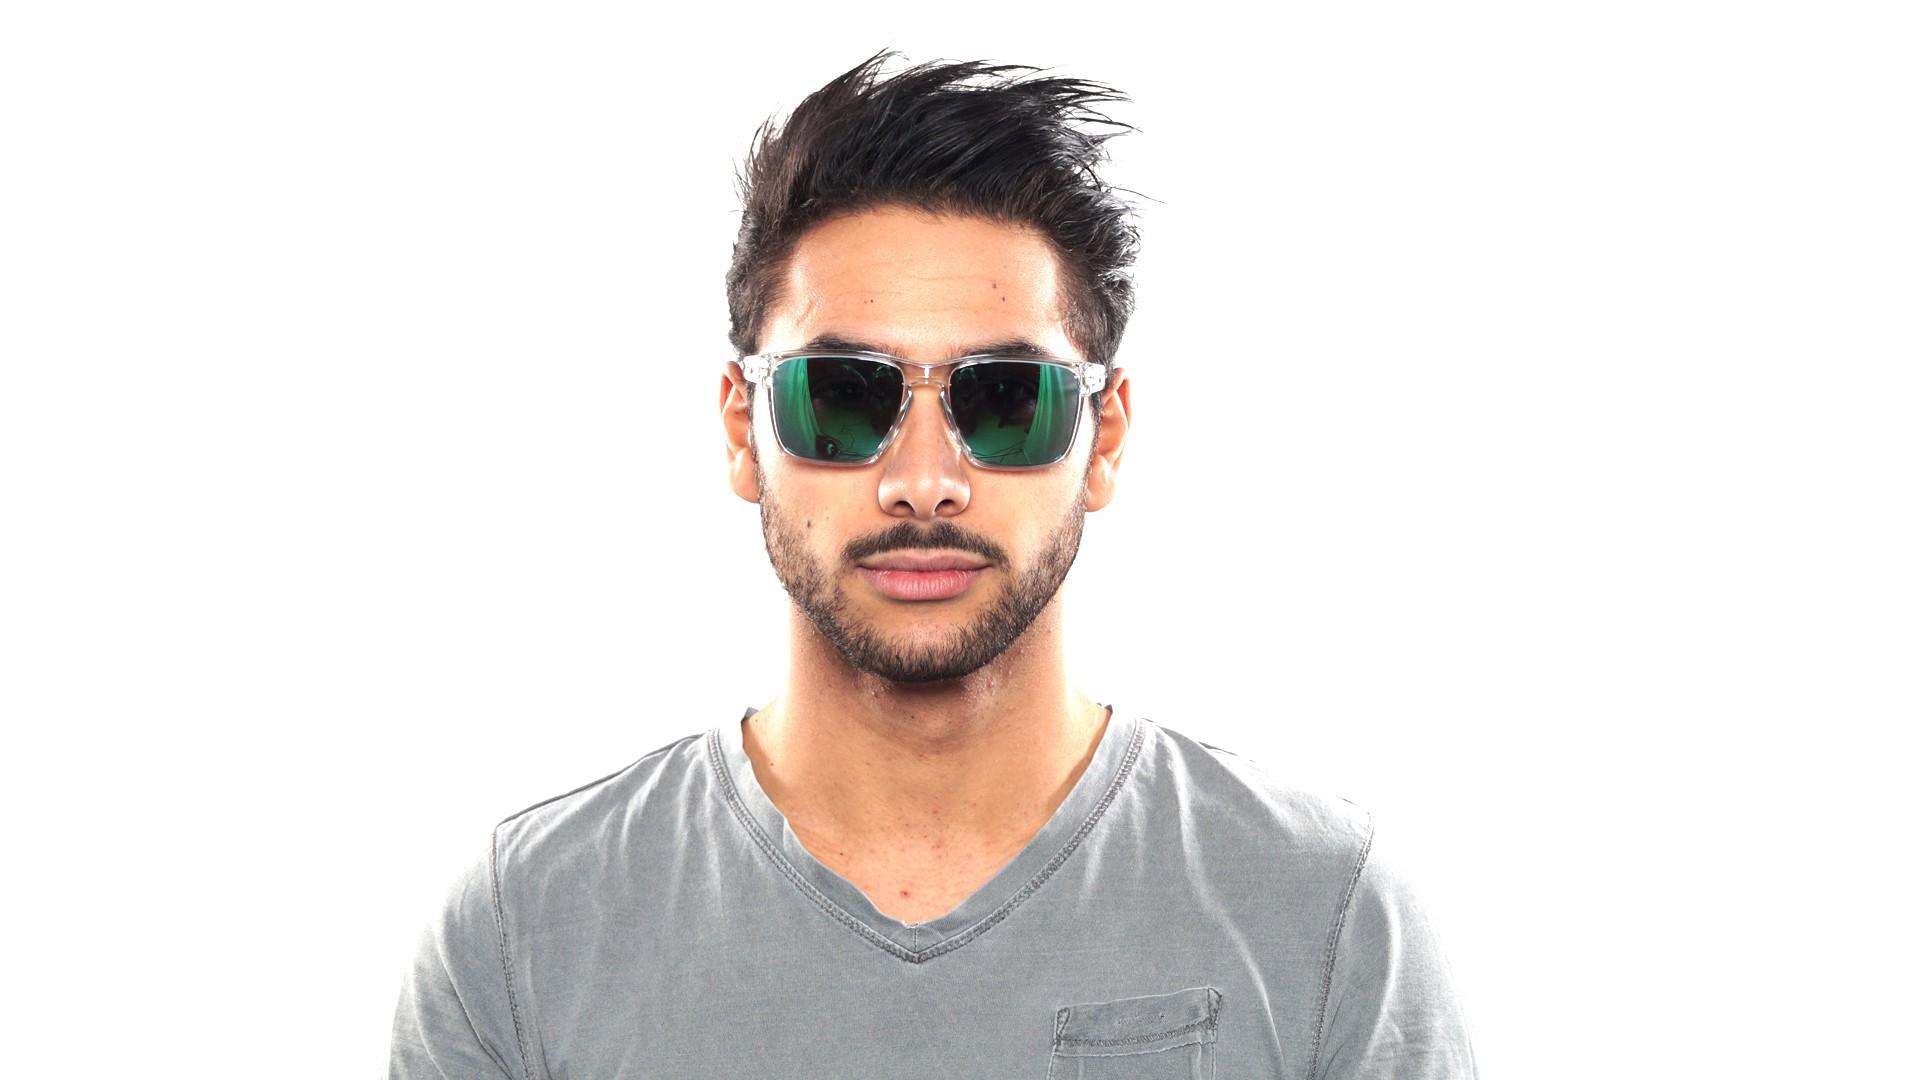 oakley sliver polarized sunglasses wizv  Oakley Sliver Xl Black OO9341 01 57-18 Polarized  Visiofactory